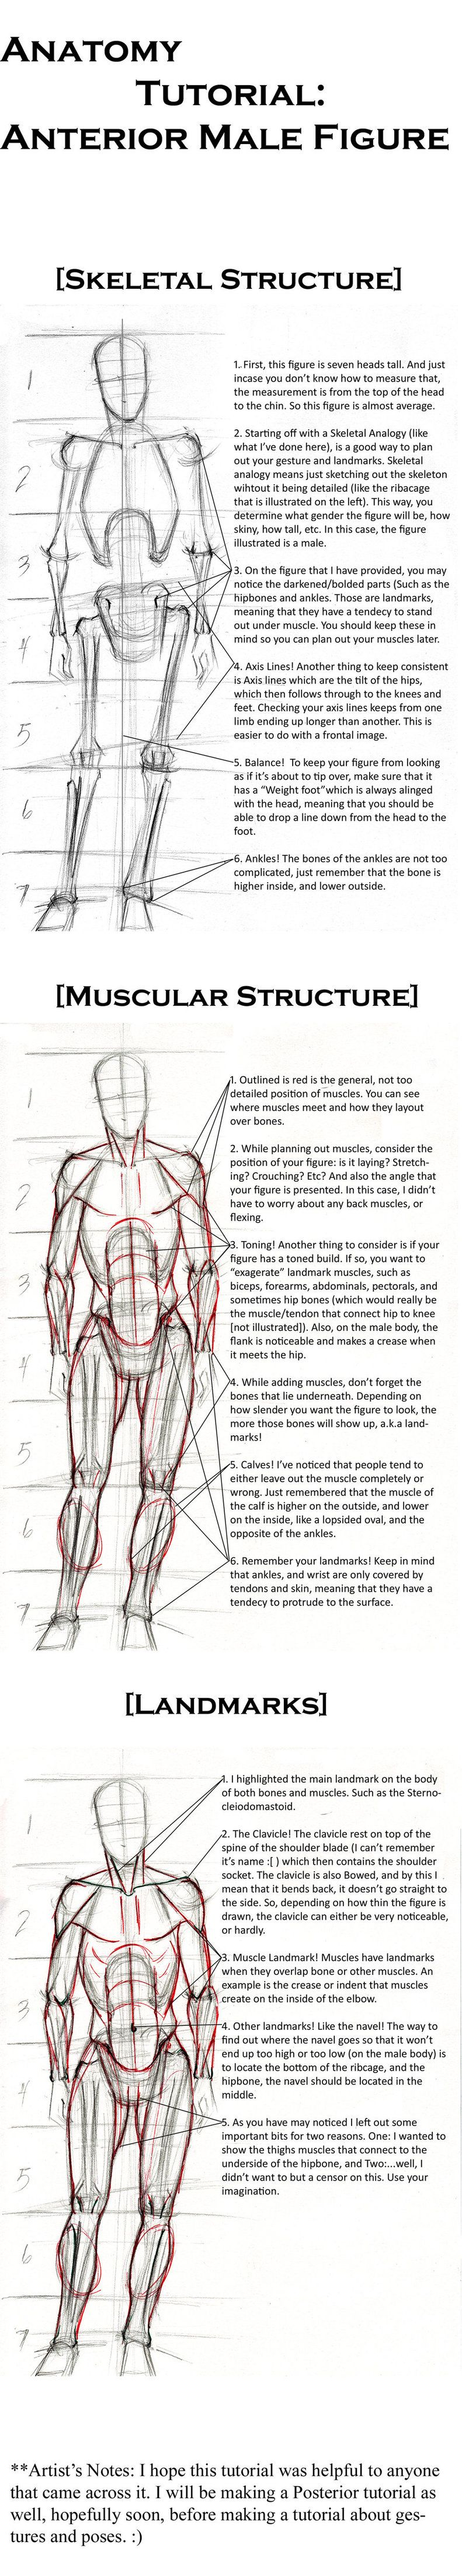 Anatomy Tutorial Anterior by LifeSymphonydeviantartcom on